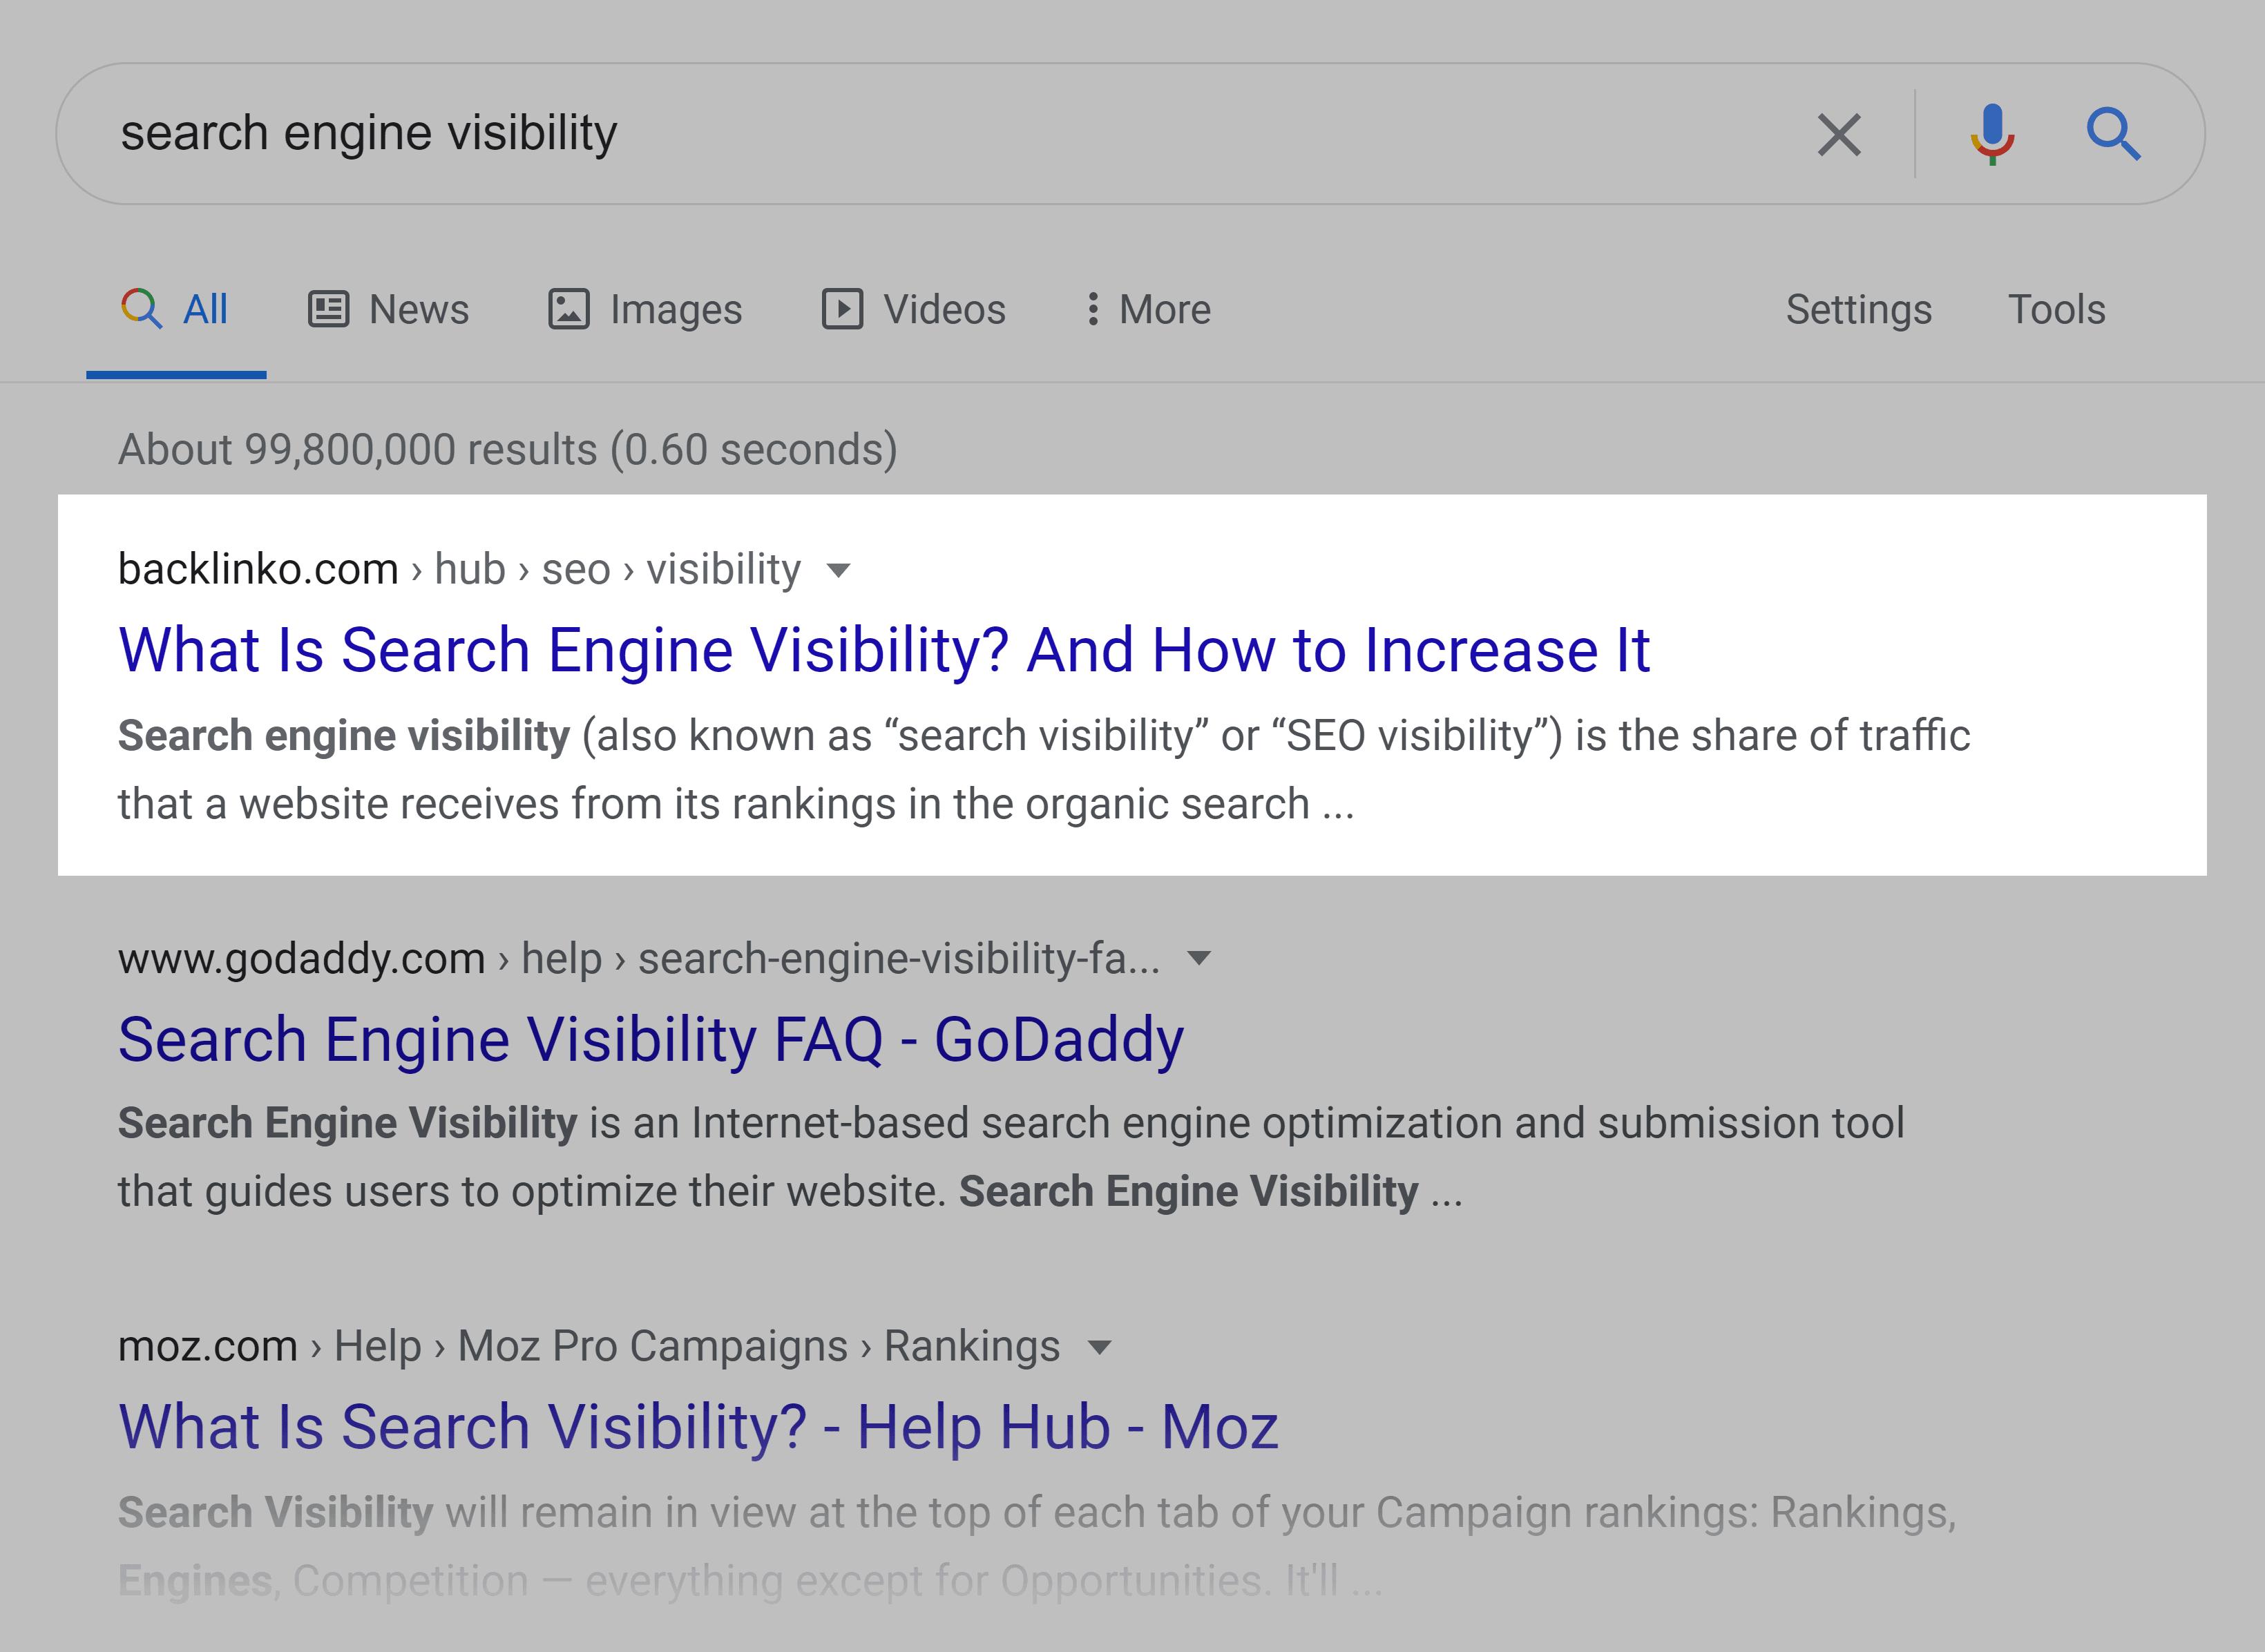 Google SERP – 搜索引擎可见性